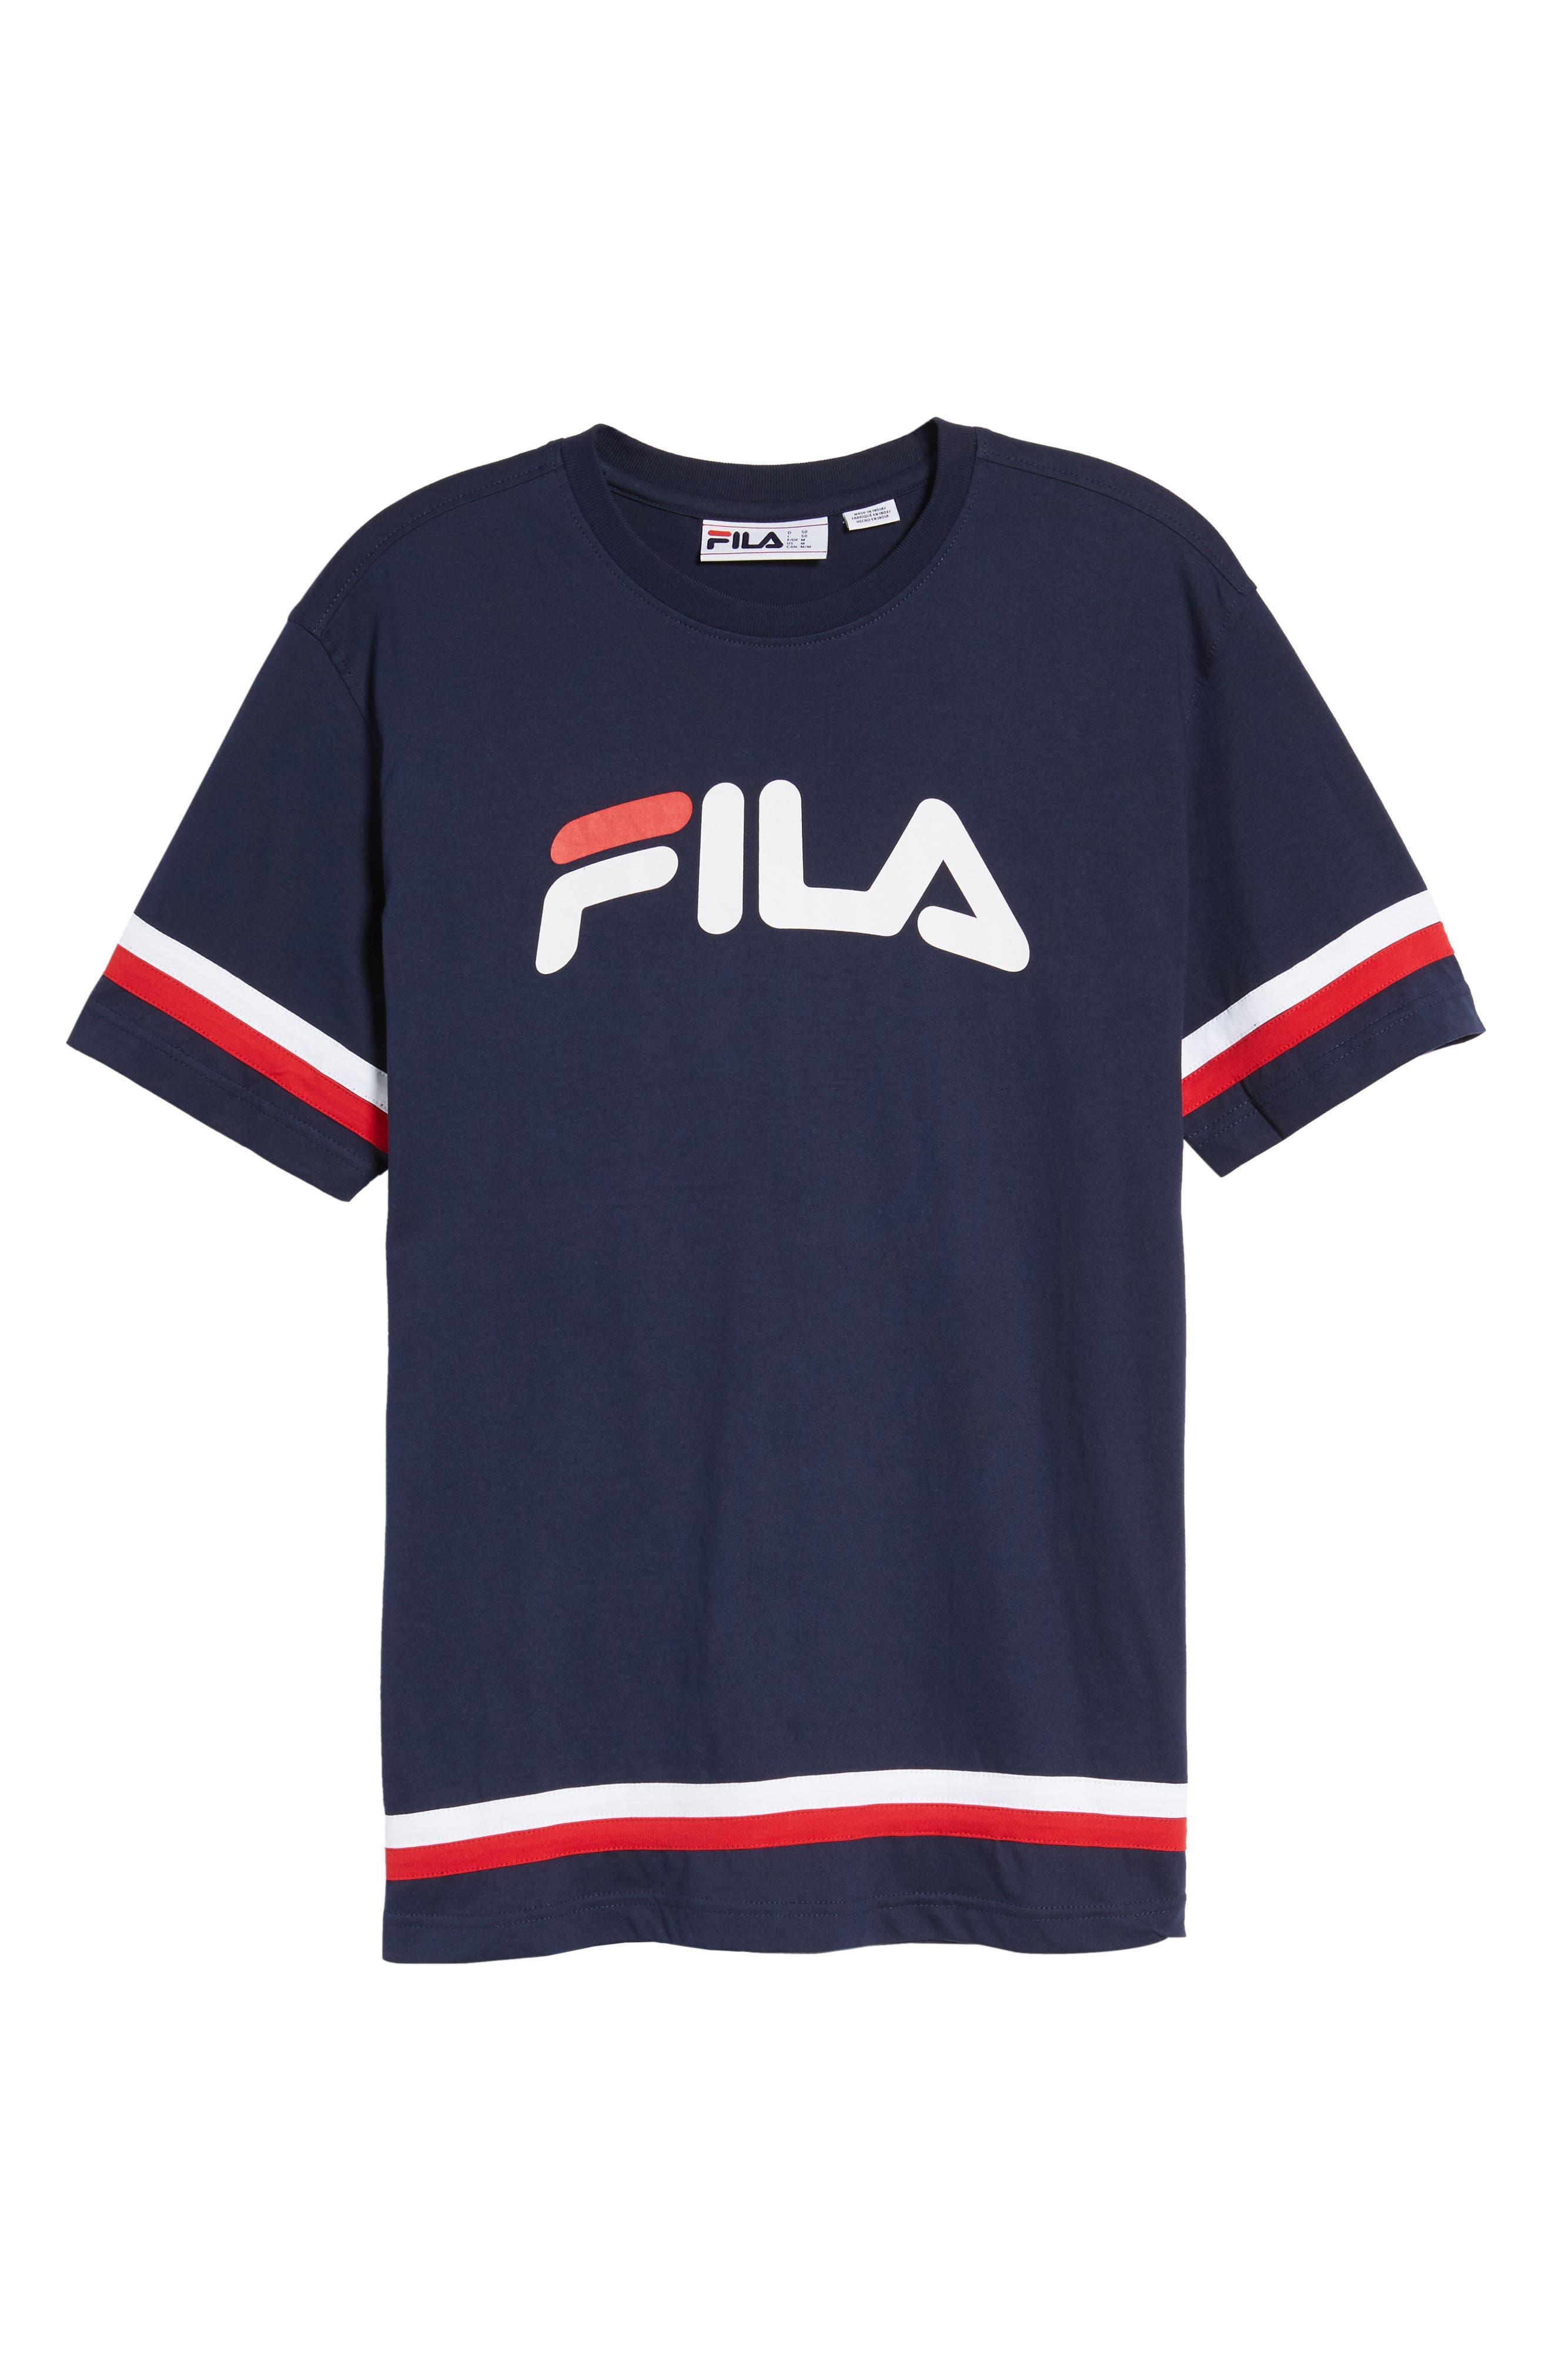 Riley T-Shirt,                             Alternate thumbnail 6, color,                             410